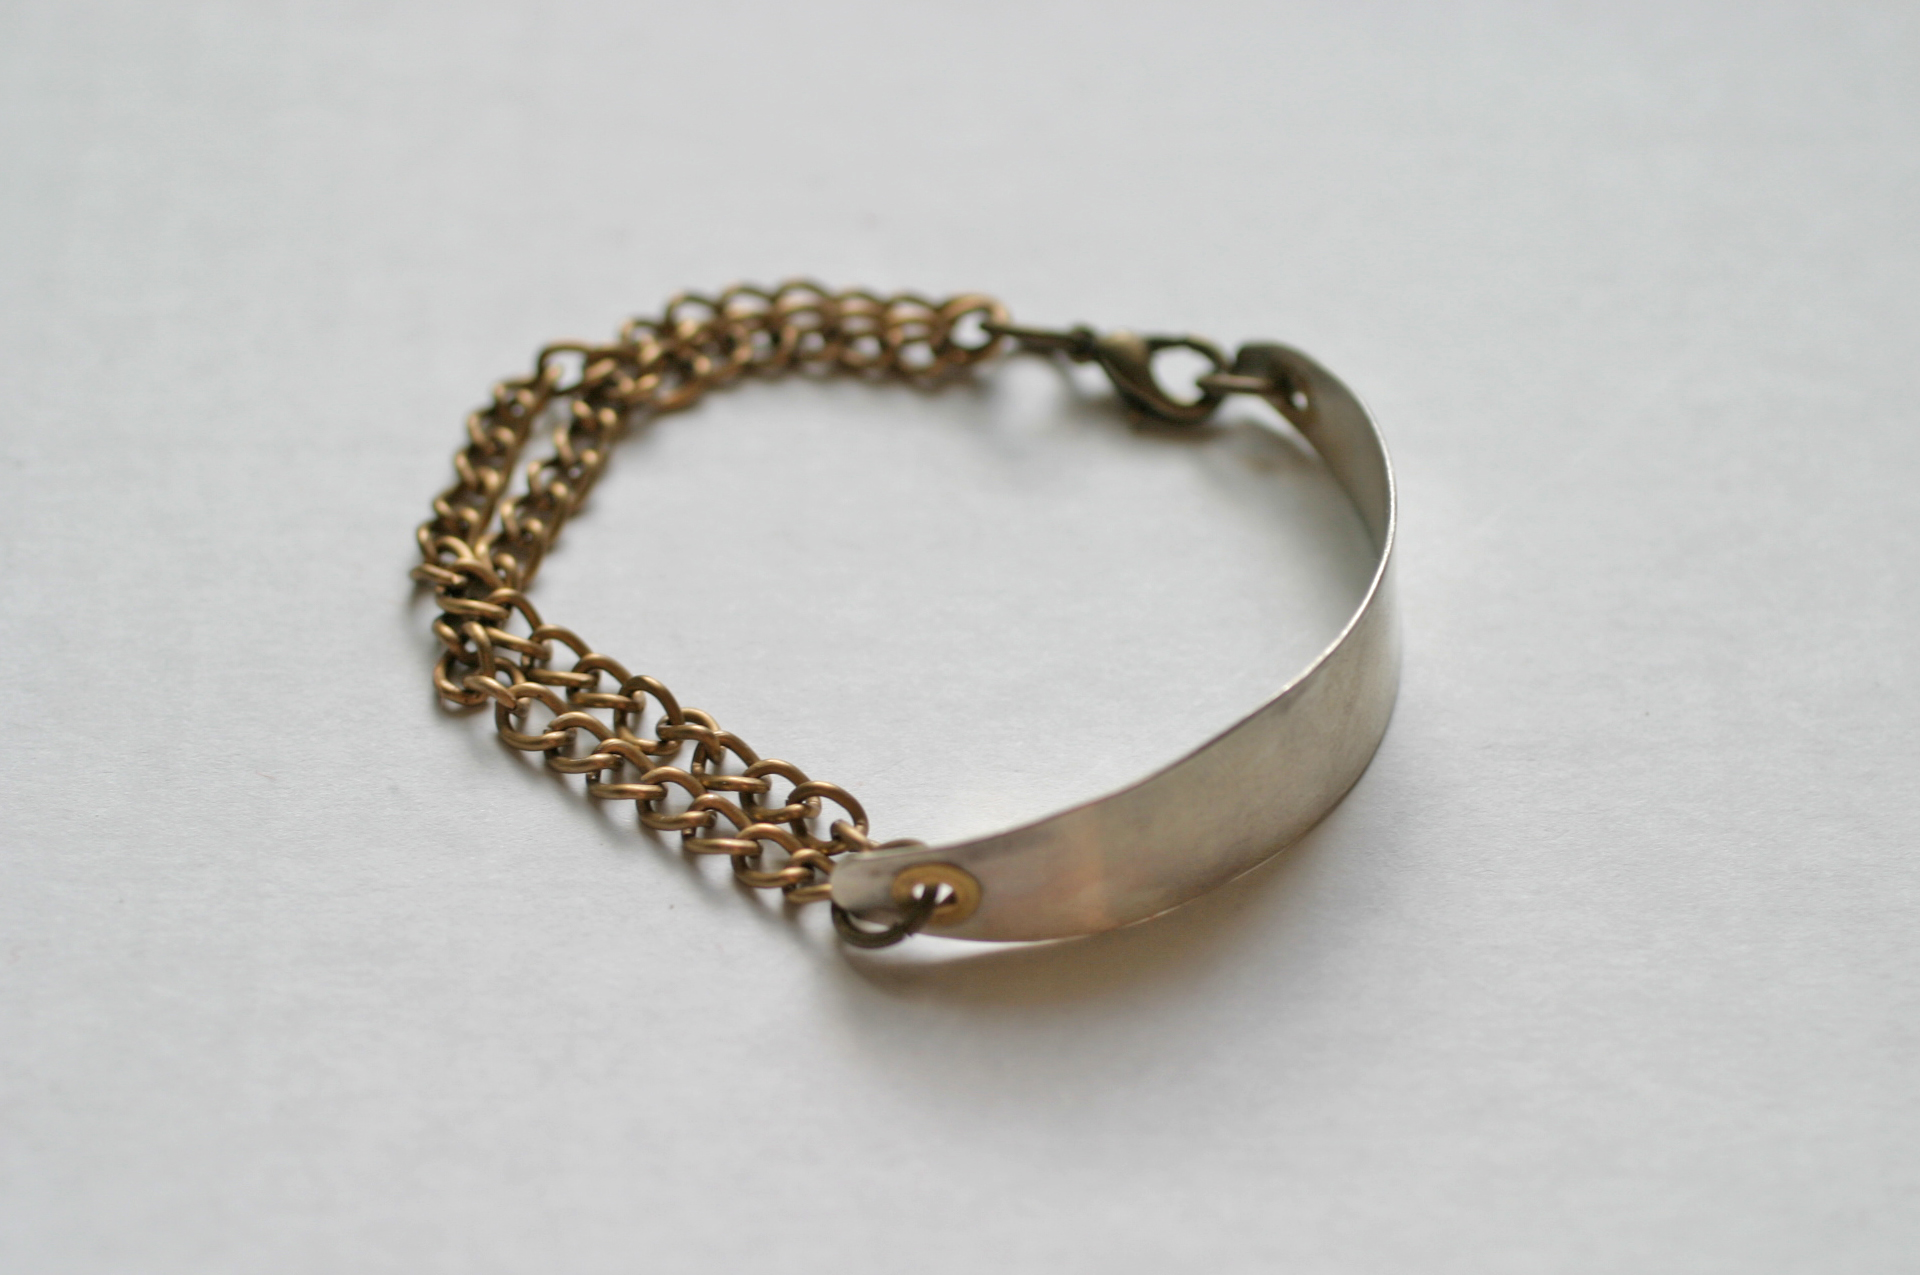 Elizabeth Baird Architecture-Jewelery-silver and brass chain bracelet.jpg